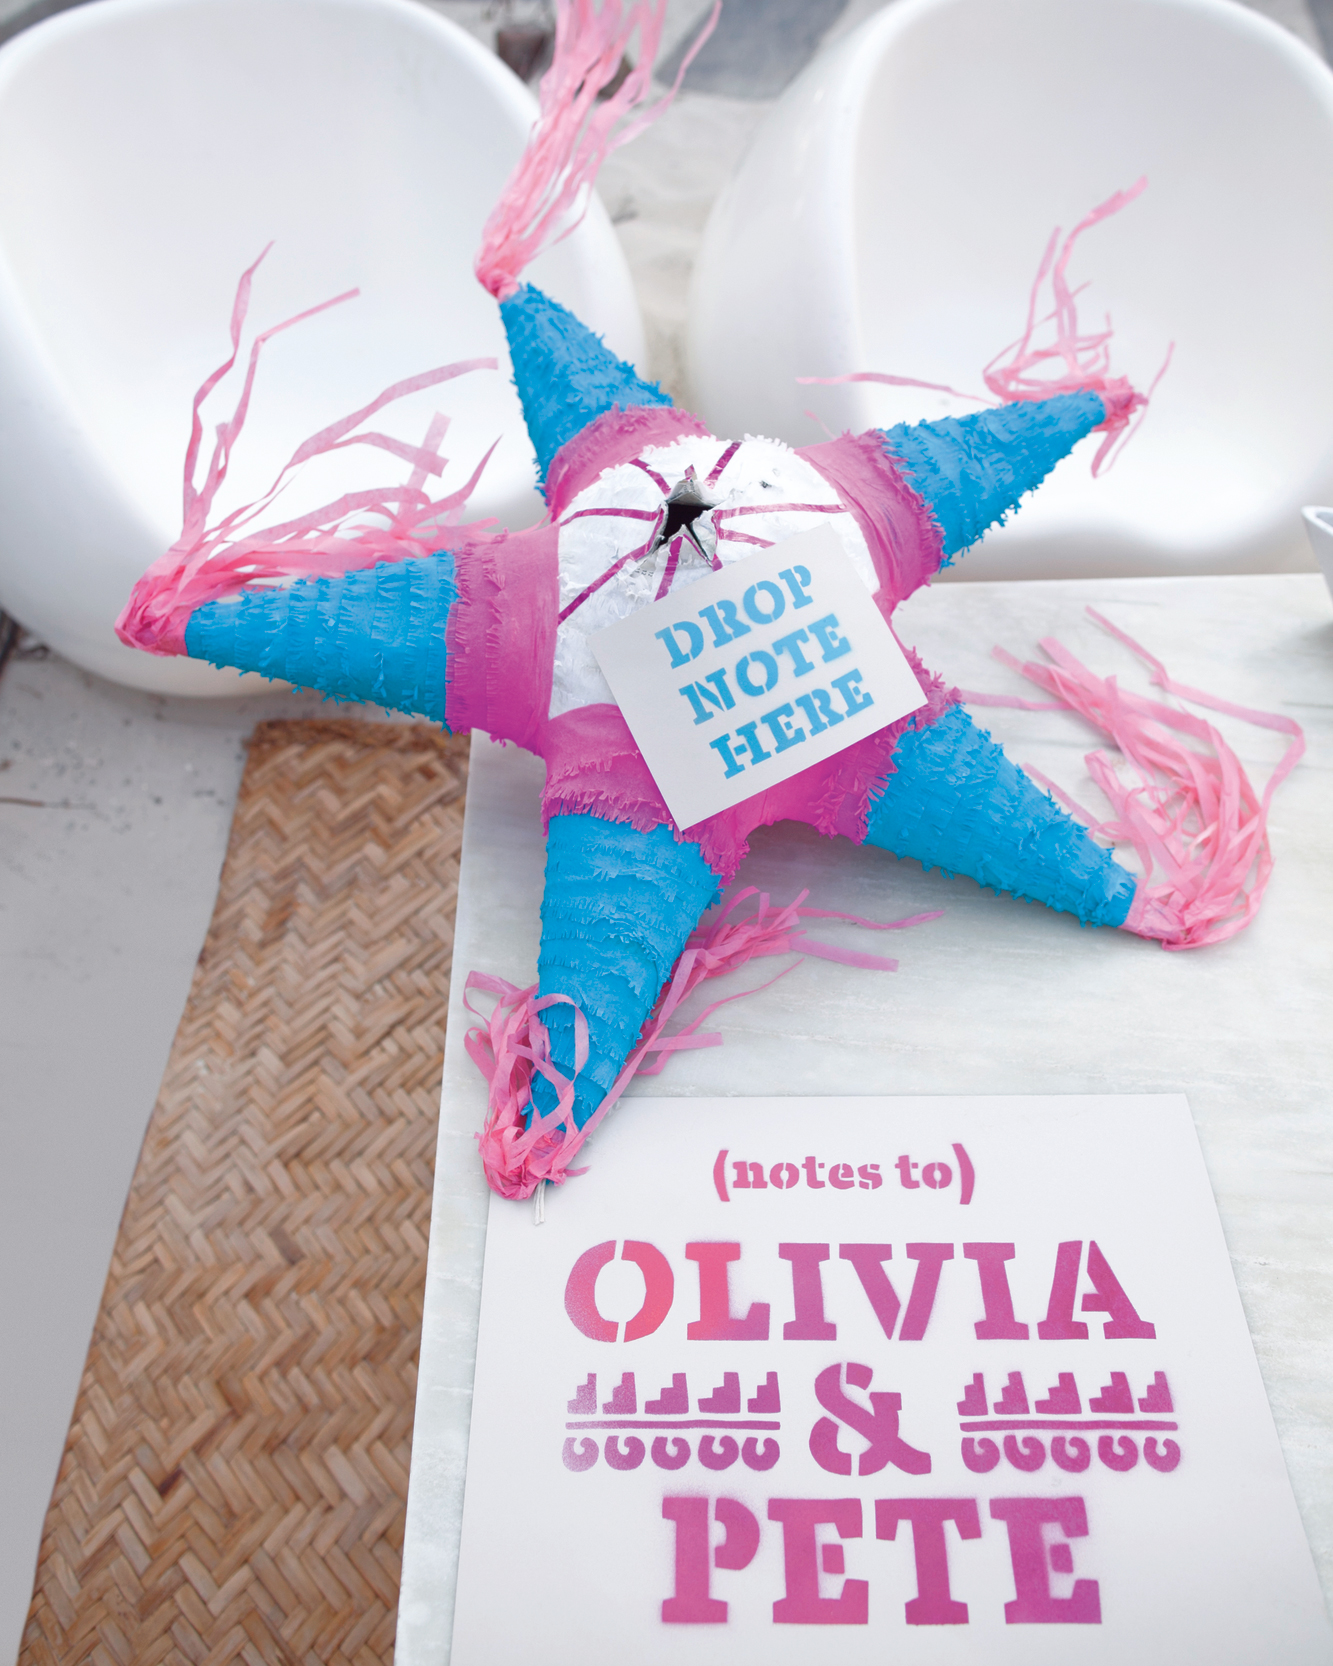 olivia-peter-0840-mwds108973.jpg